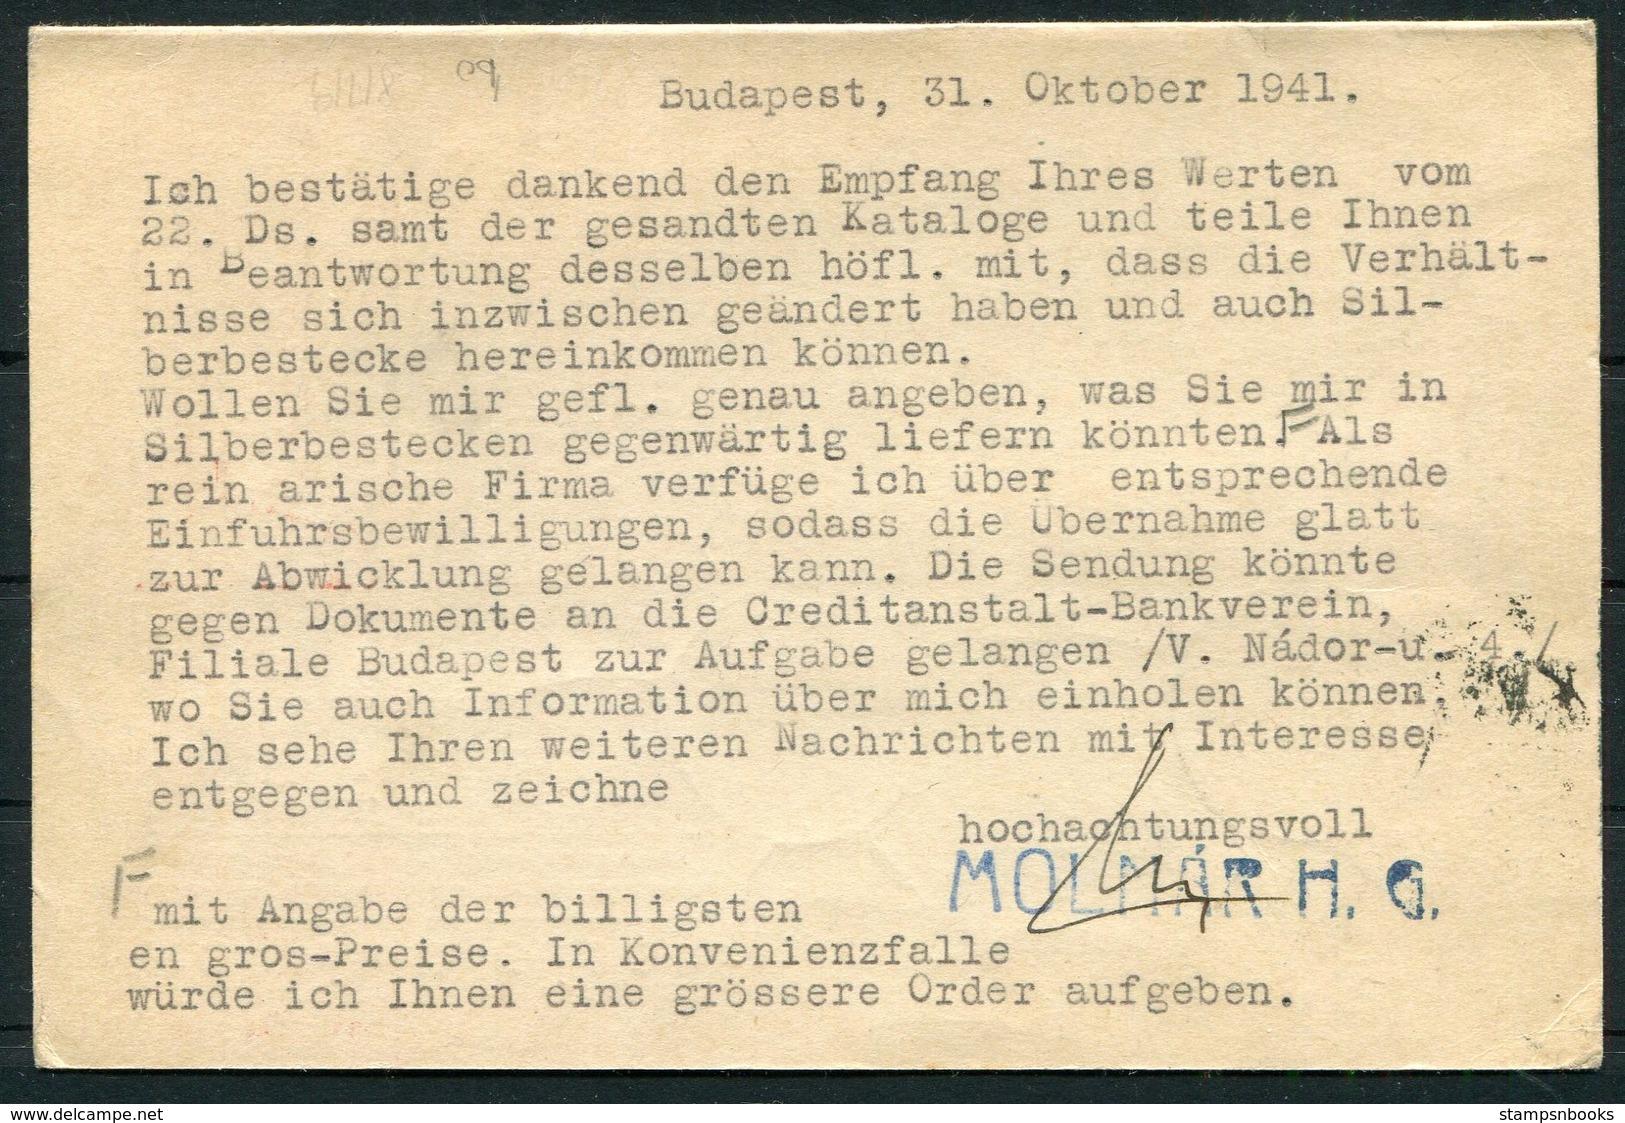 1941 Hungary Budapest HG Molnarh Jewelery Typewriter Postcard - Heilbronn Germany. Censor, Victory V - Briefe U. Dokumente